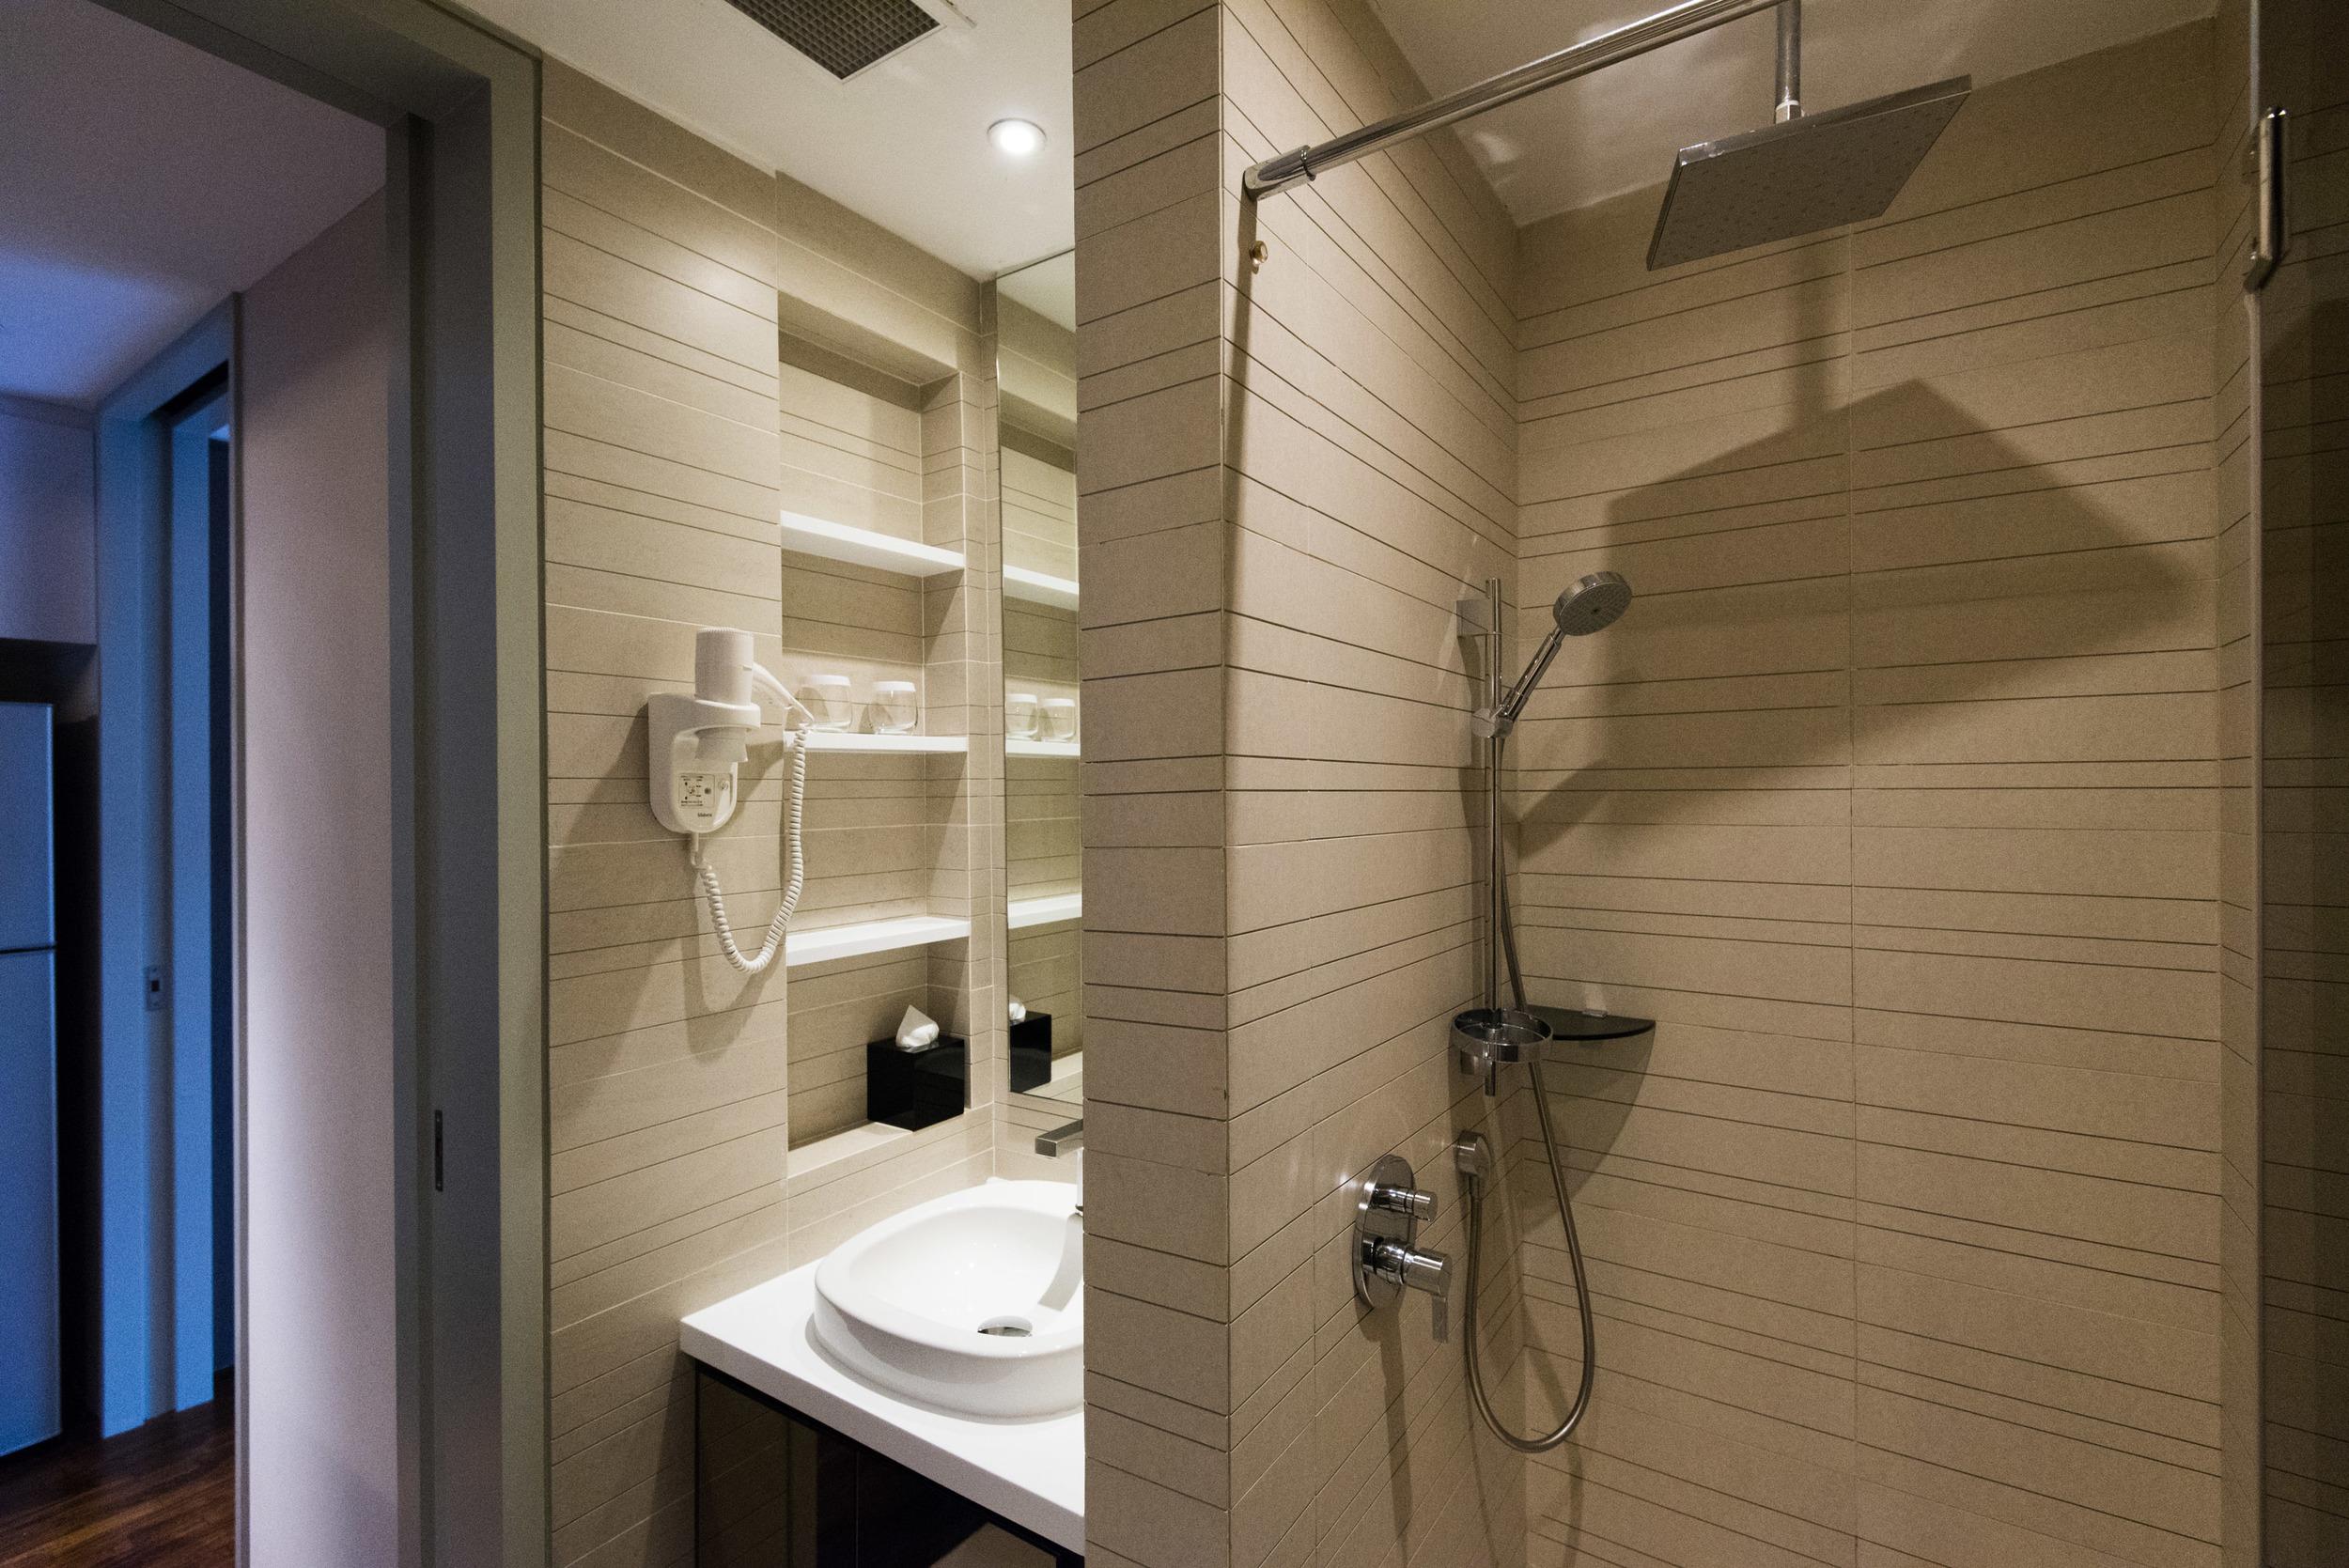 Rain Shower in the Bathroom of the One Bedroom Deluxe Suite